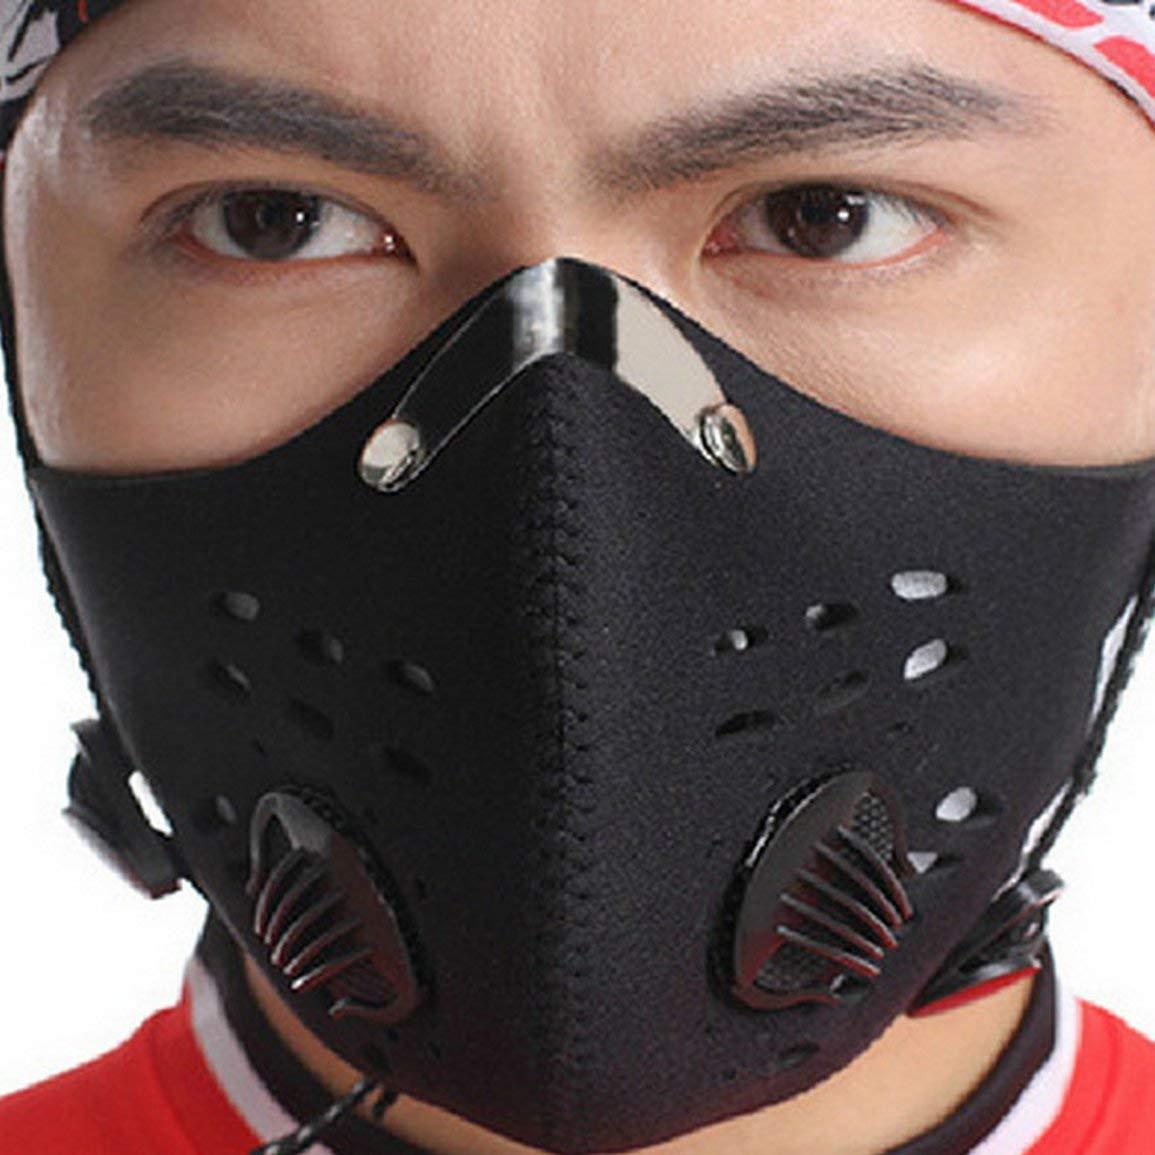 garciaria masque anti pollution